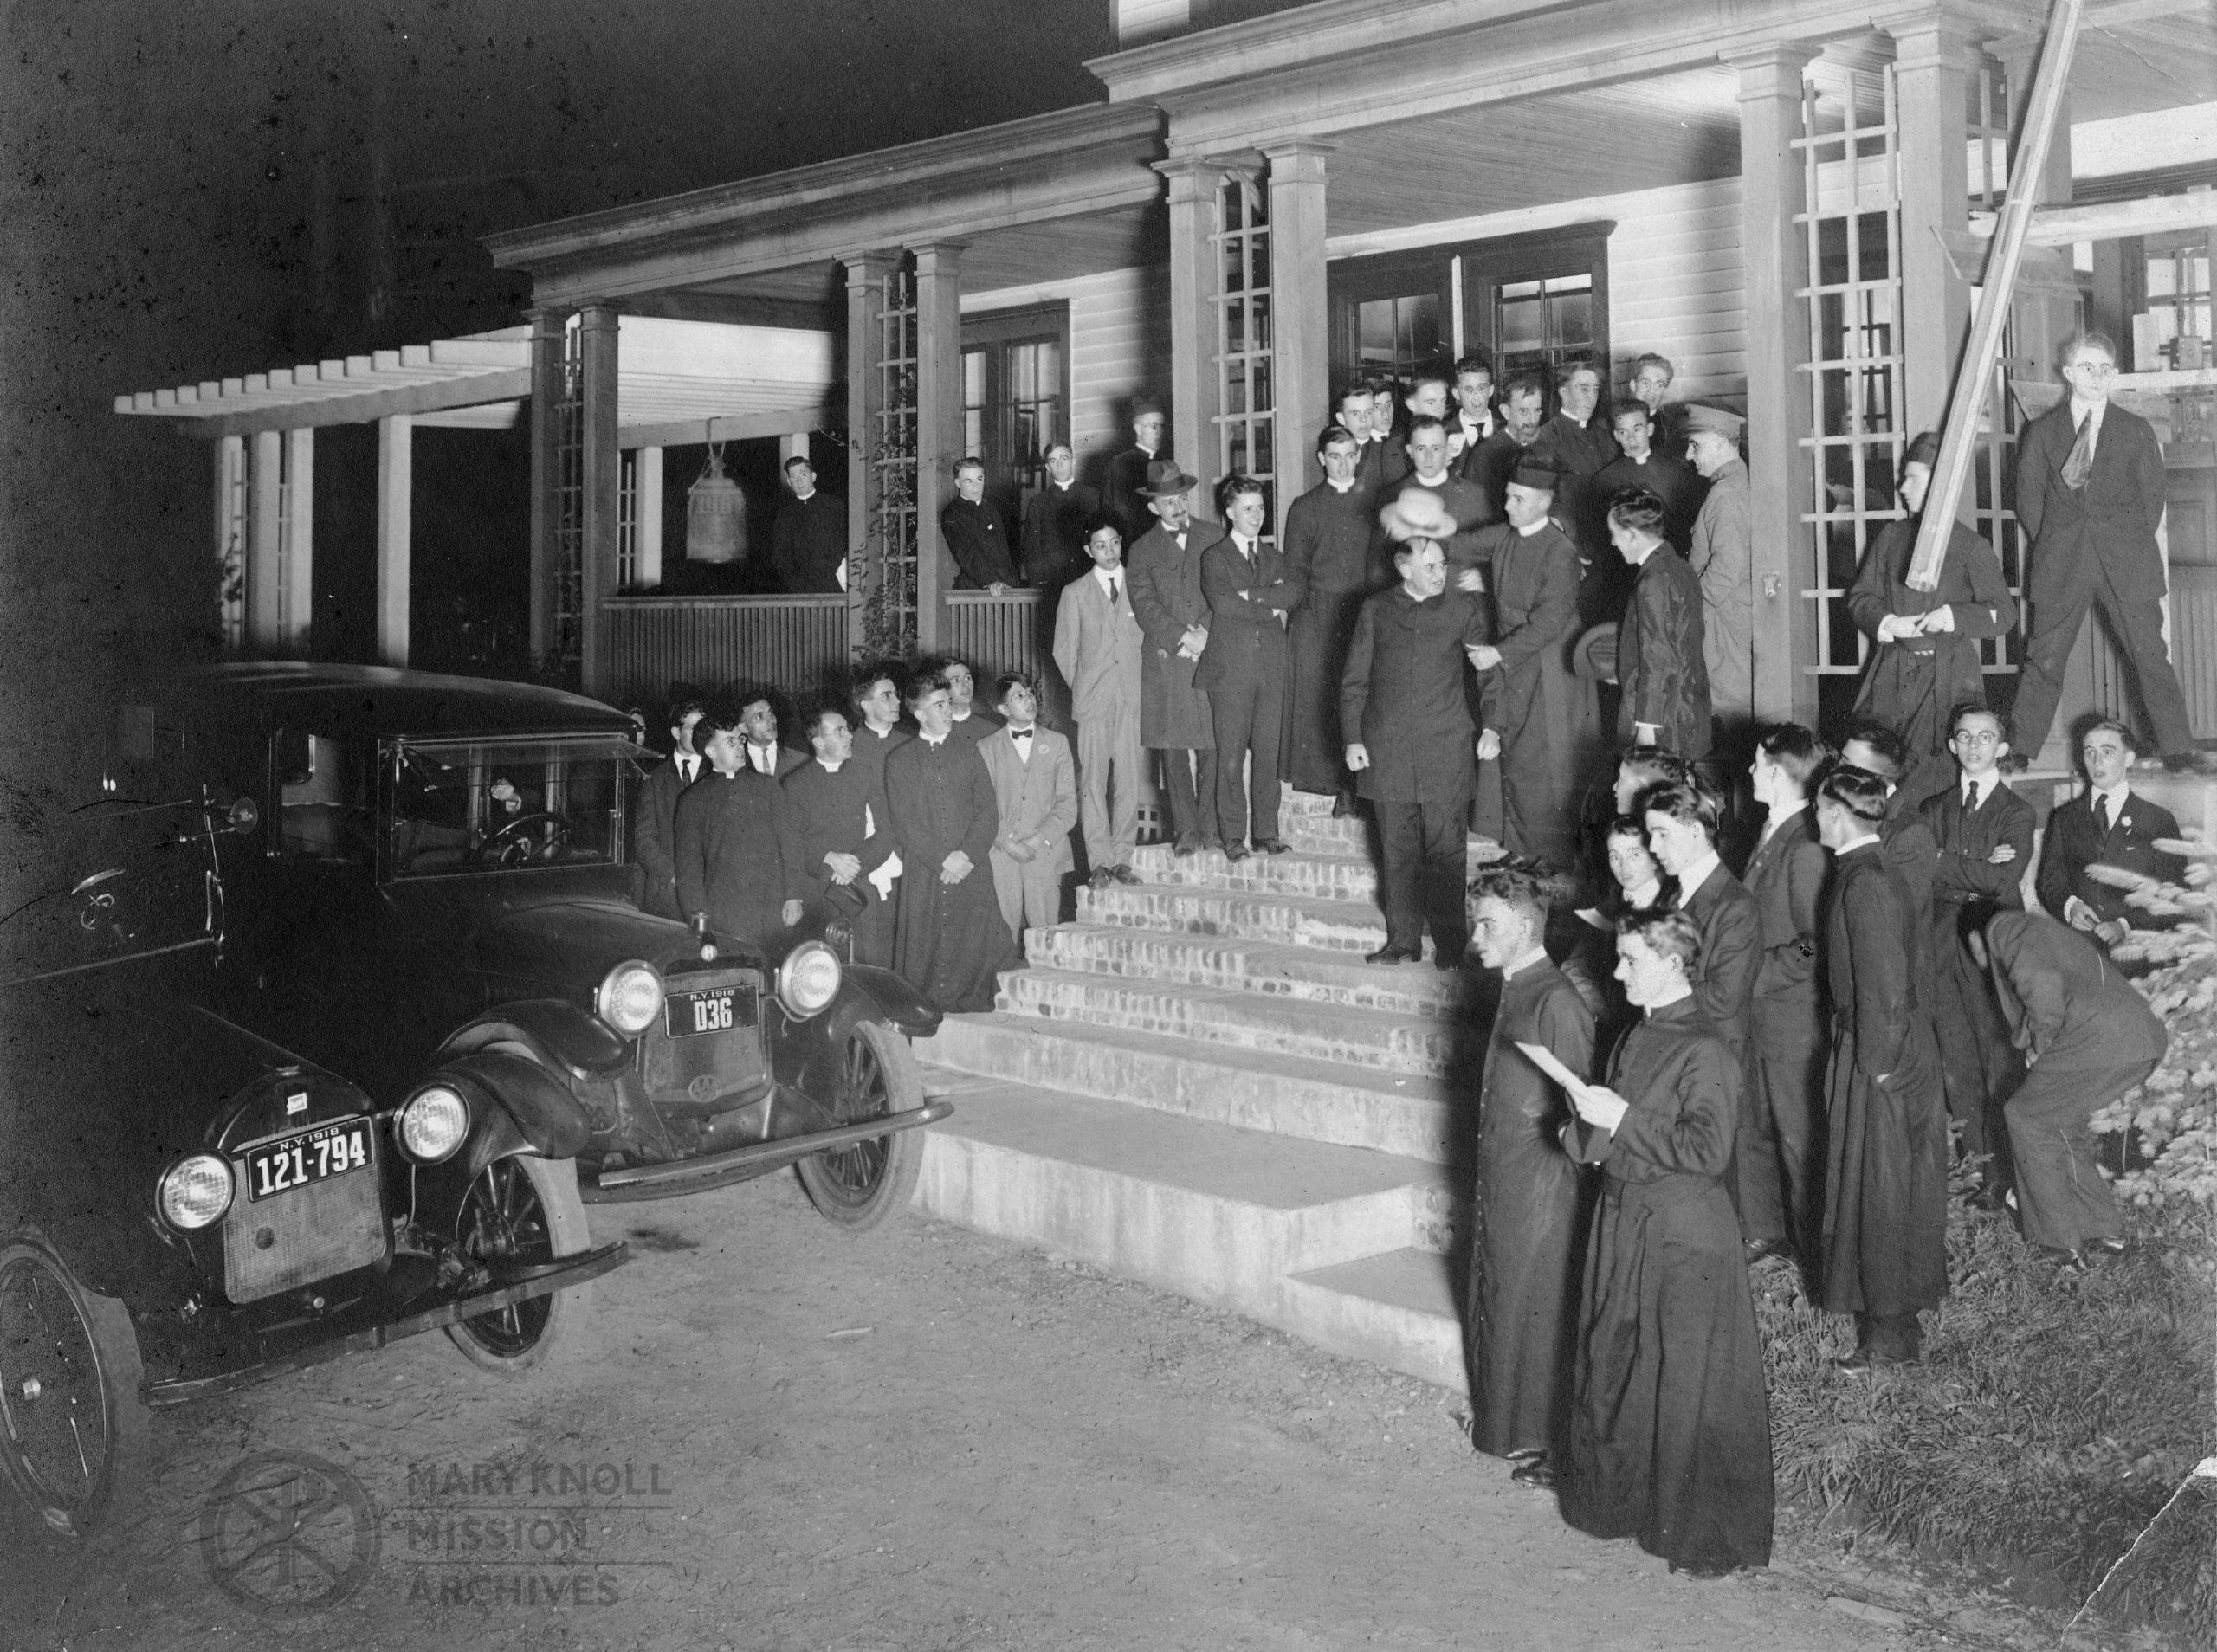 Departure, 1918 - Fr. Thomas F. Price